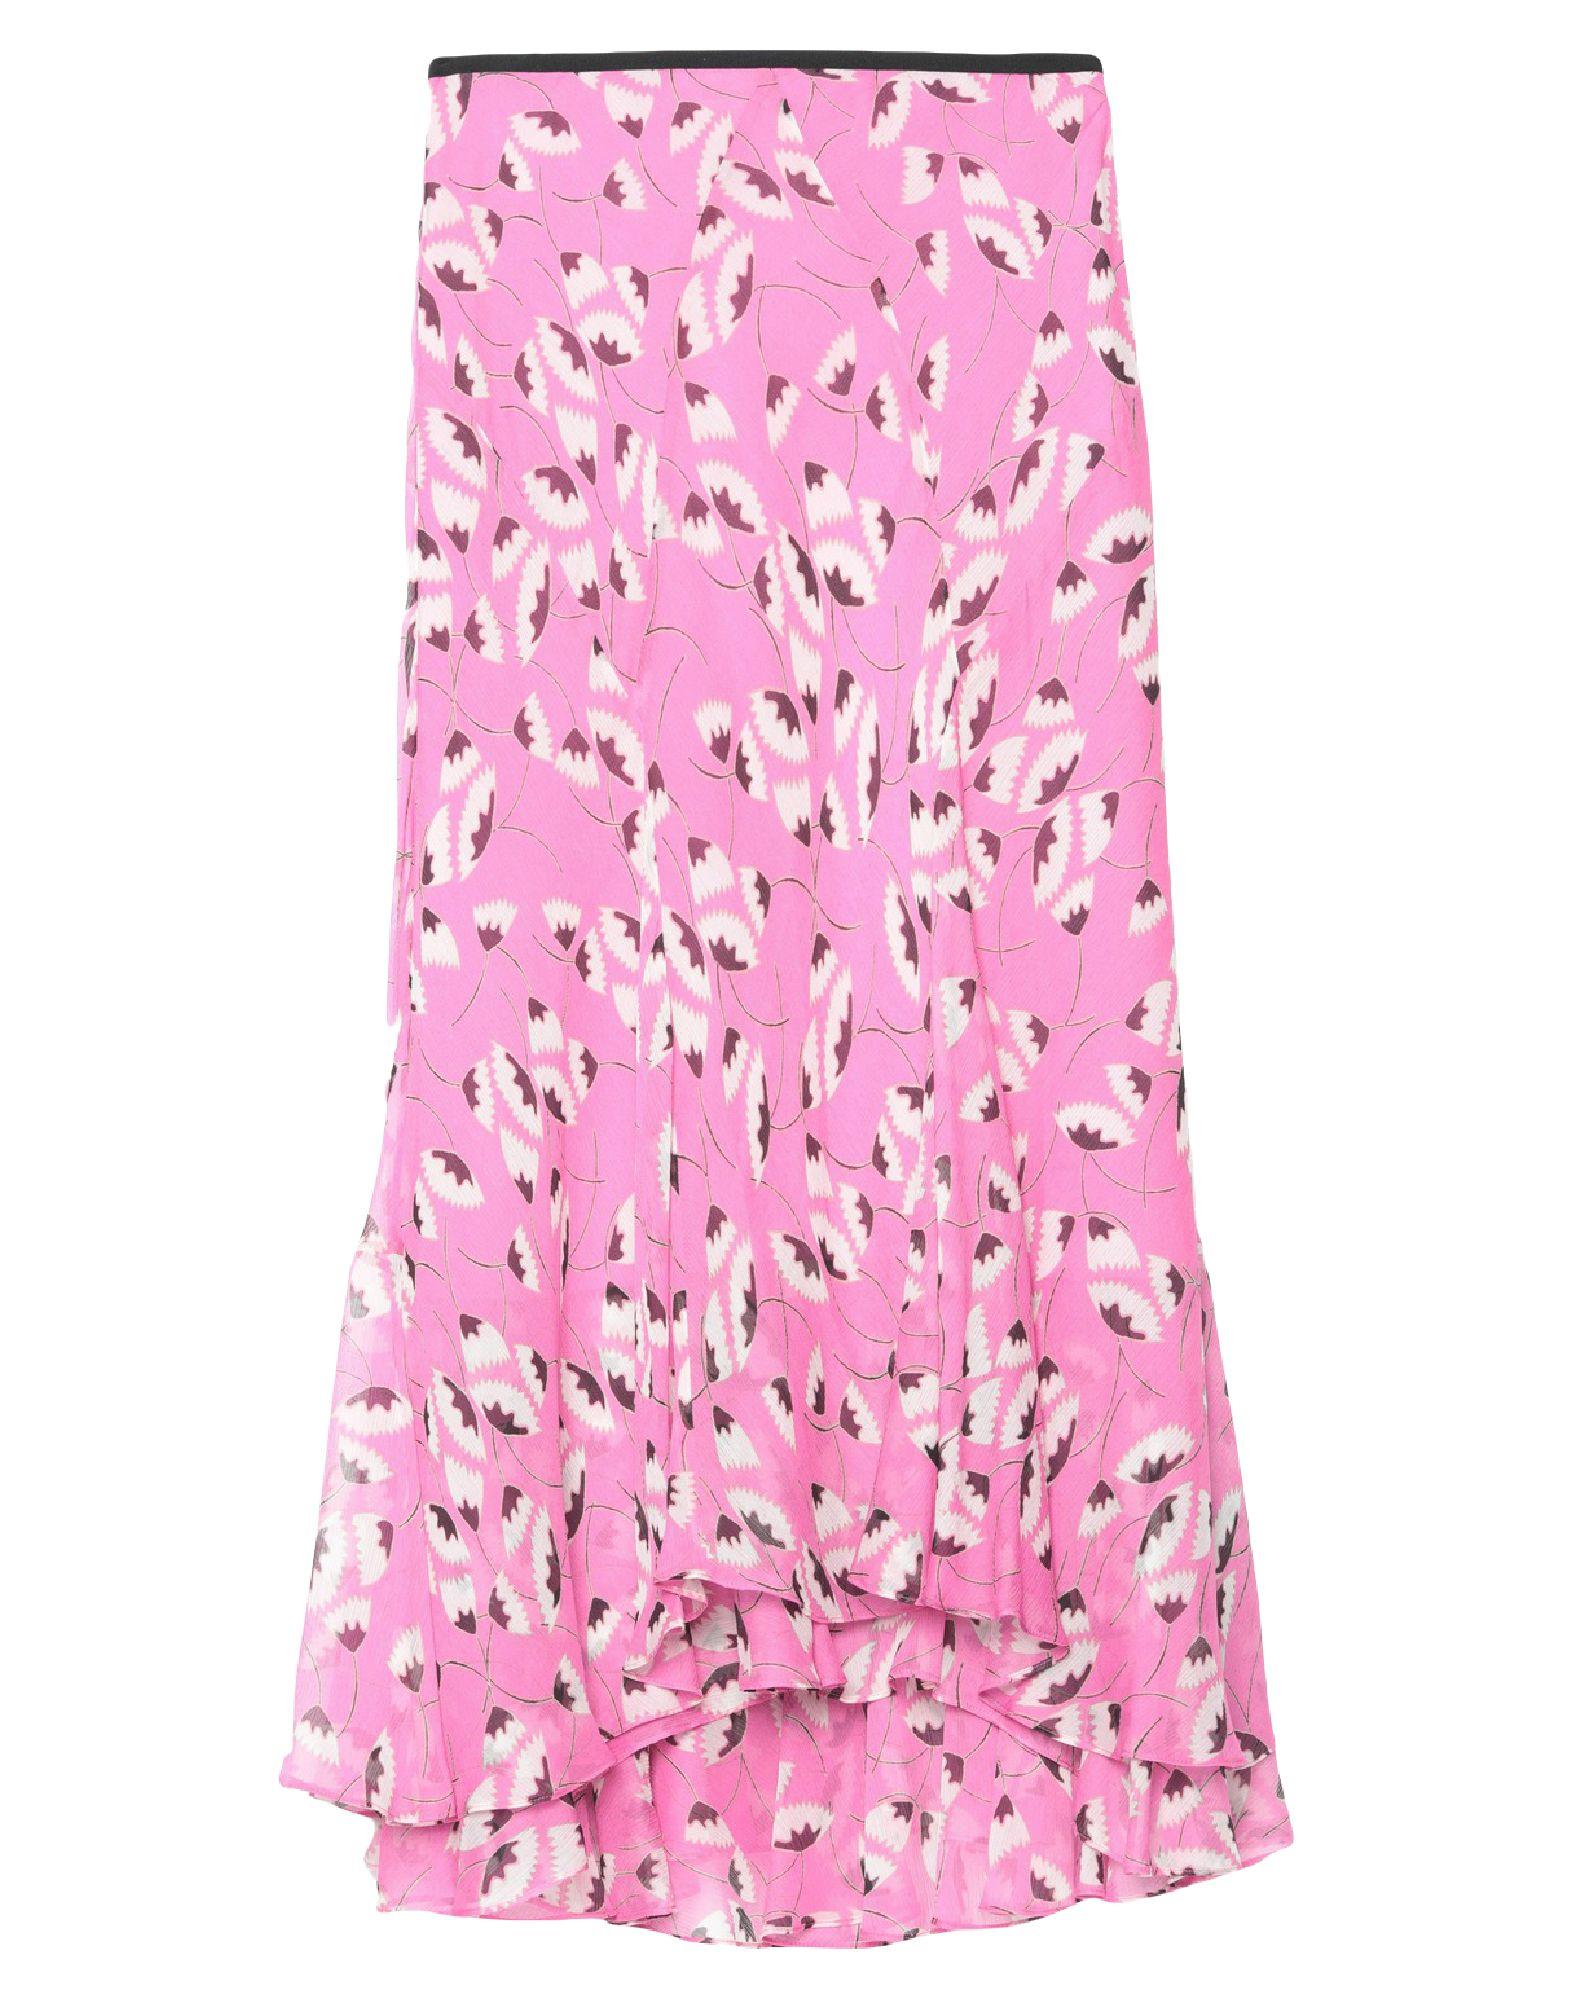 DIANE VON FURSTENBERG Длинная юбка юбка diane von furstenberg юбки макси длинные